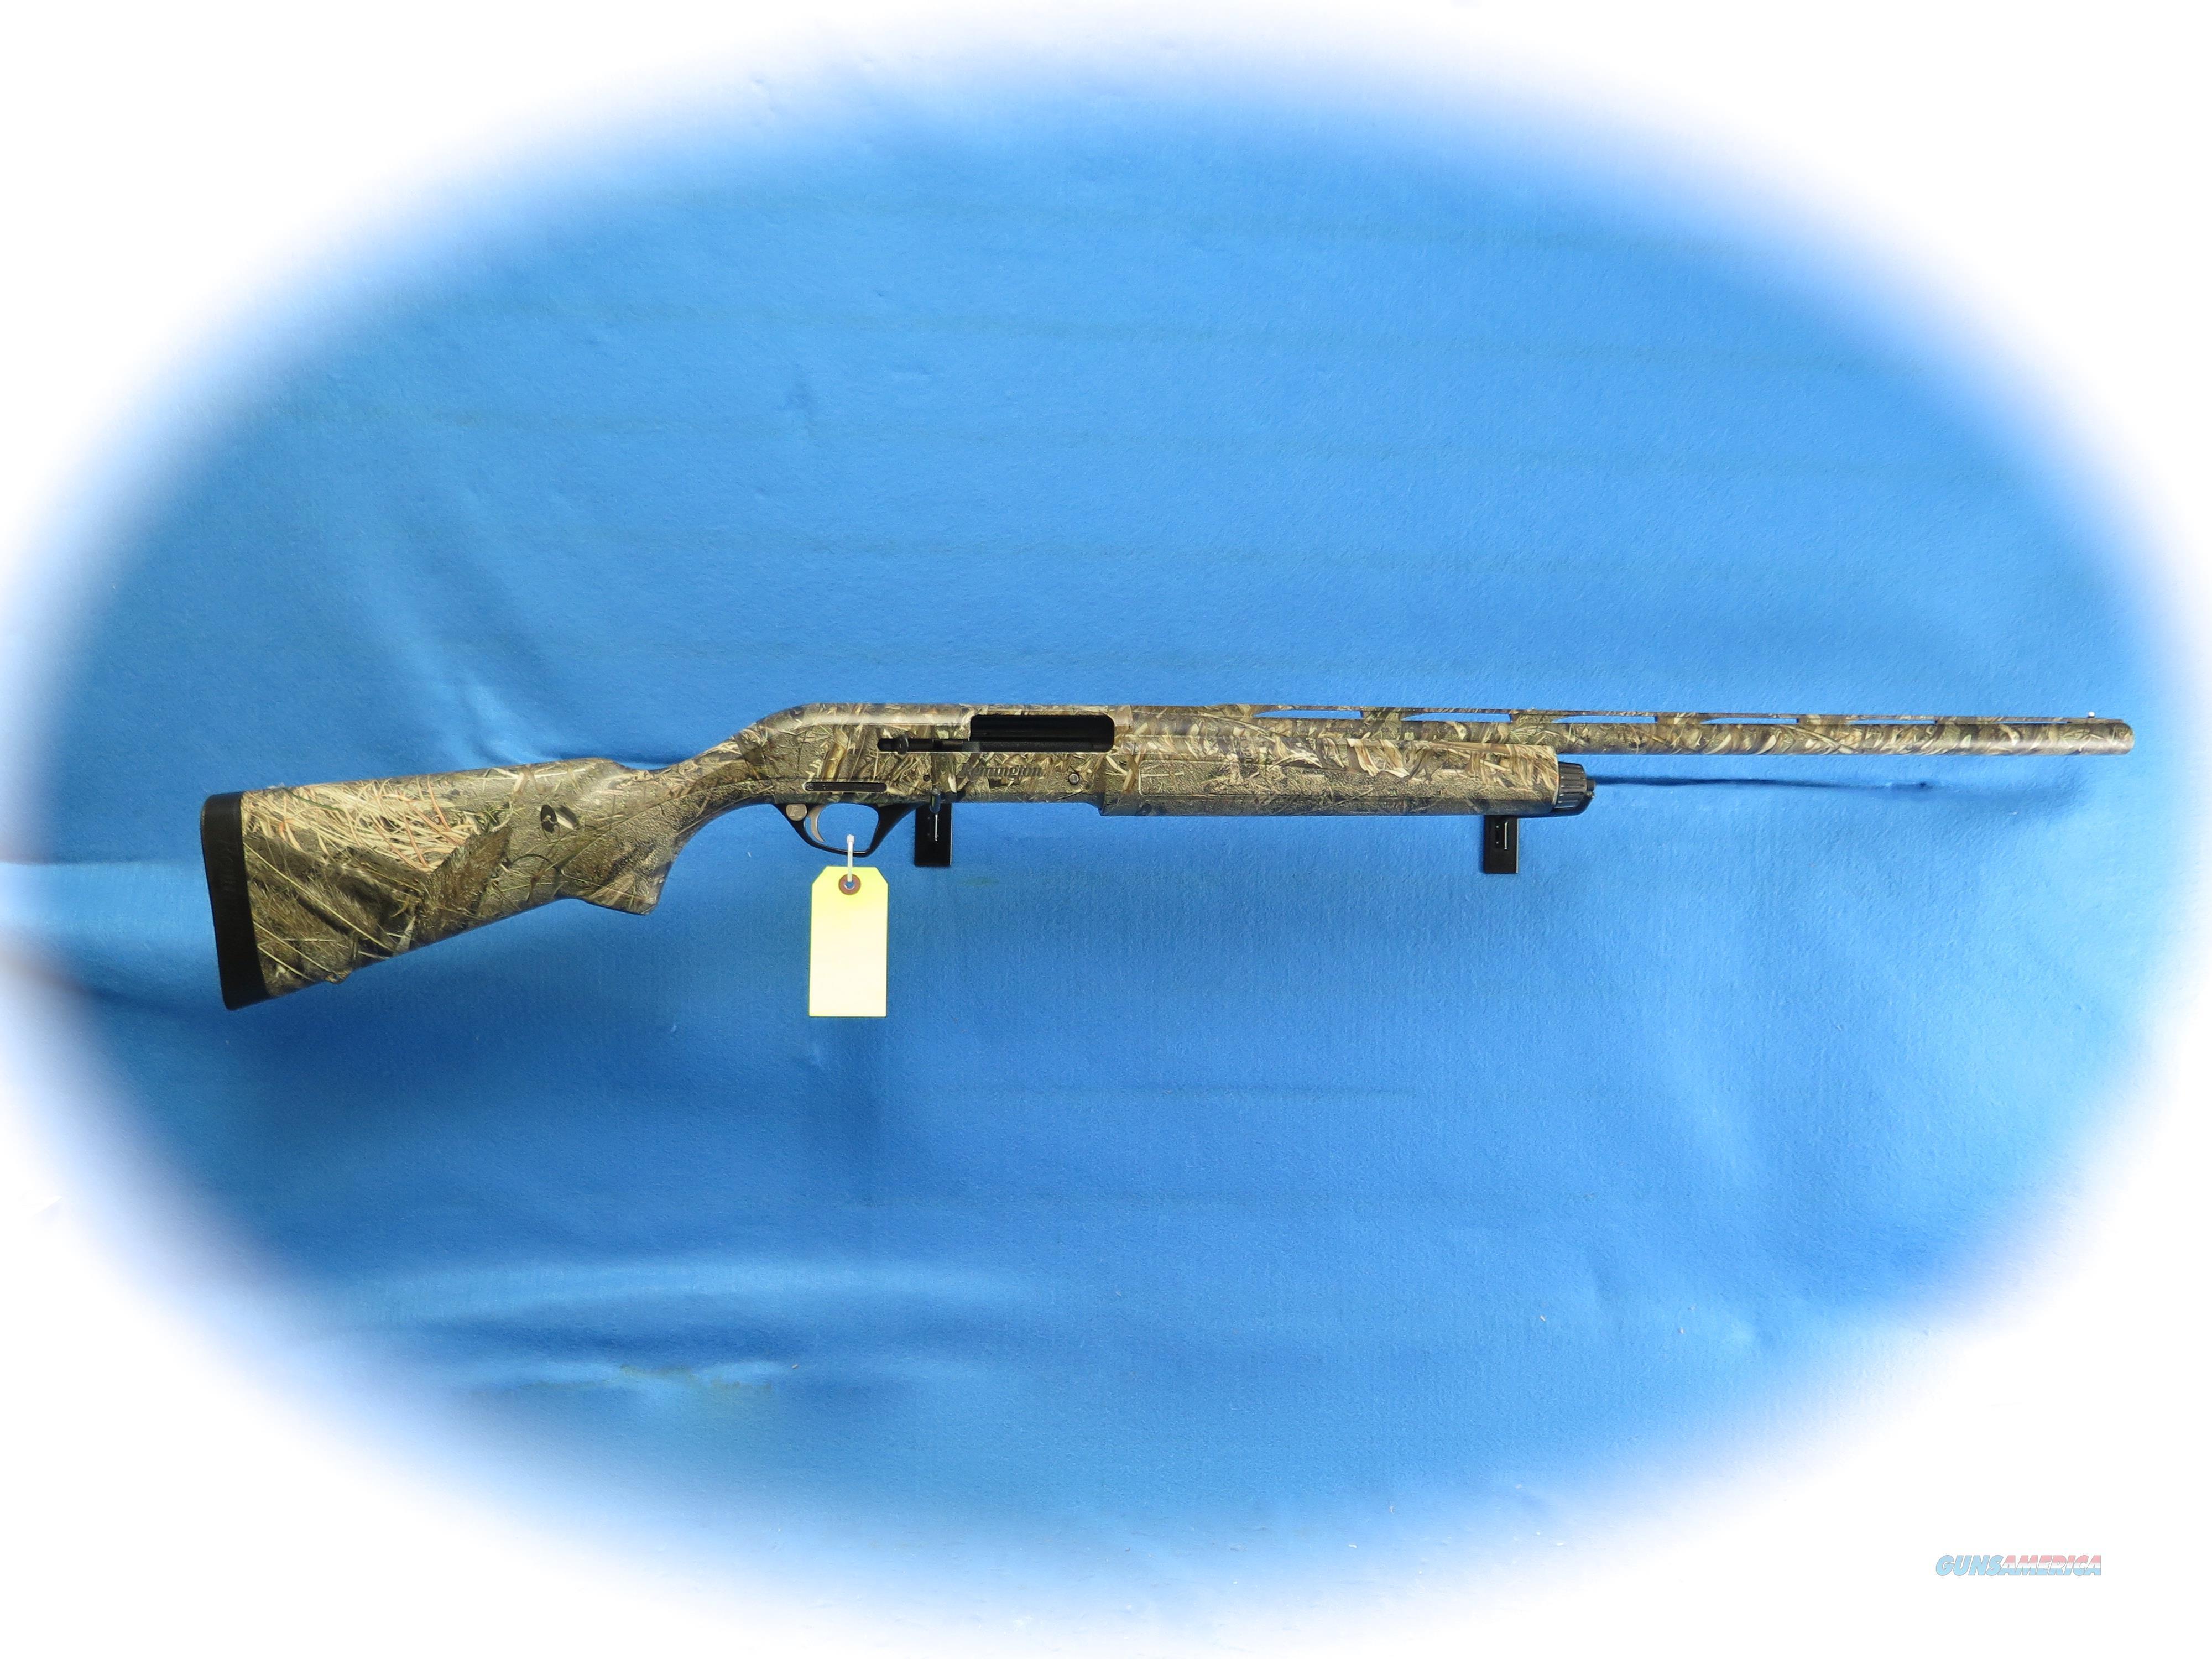 Remington Versa Max Sportsman MODB 12 Ga. Semi Auto Shotgun **New**  Guns > Shotguns > Remington Shotguns  > Autoloaders > Hunting